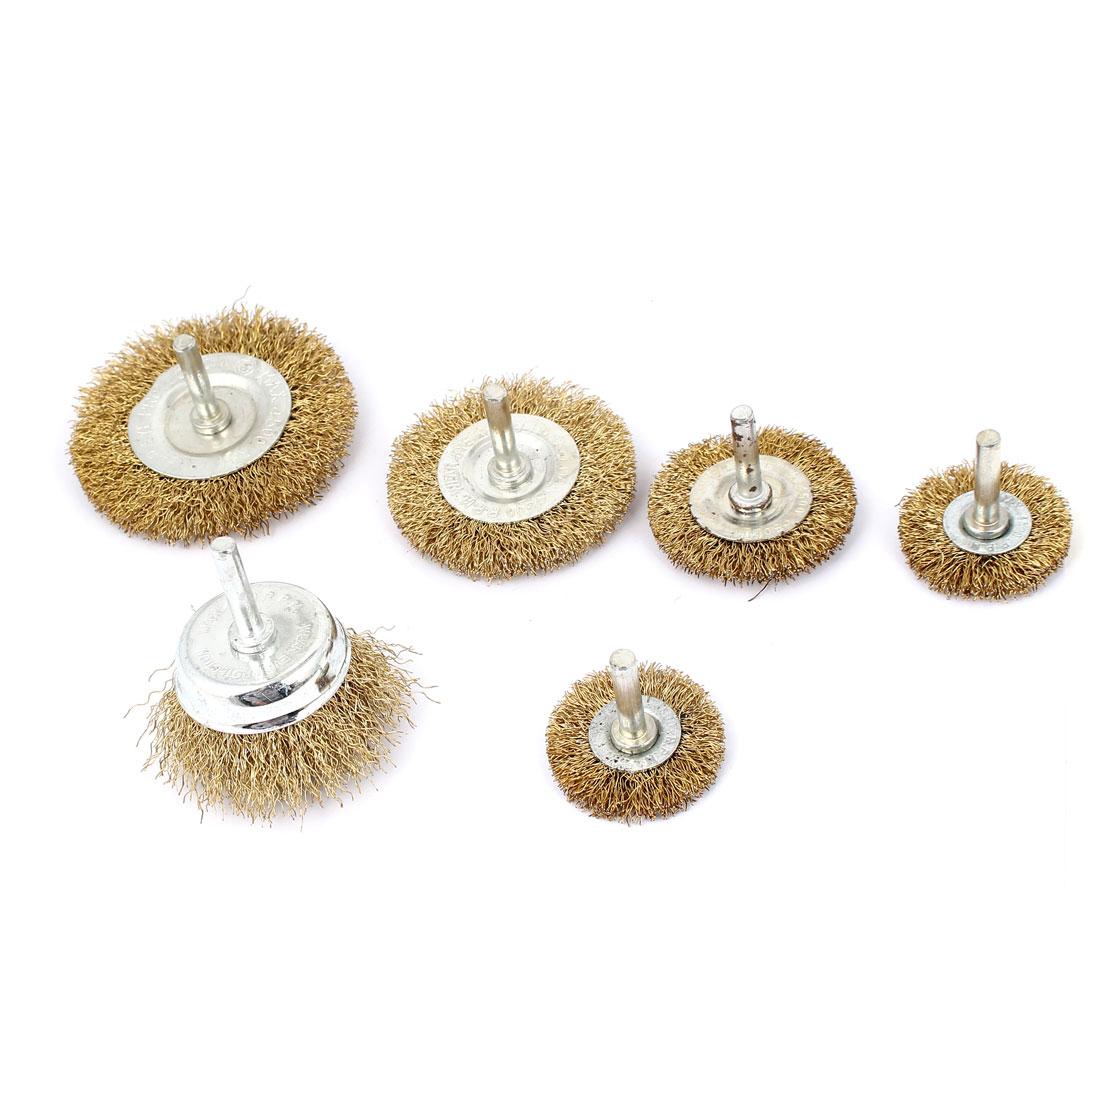 6 in 1 Wire Wheel Brush Grinder Polishing Rotary Tool Metalworking Set